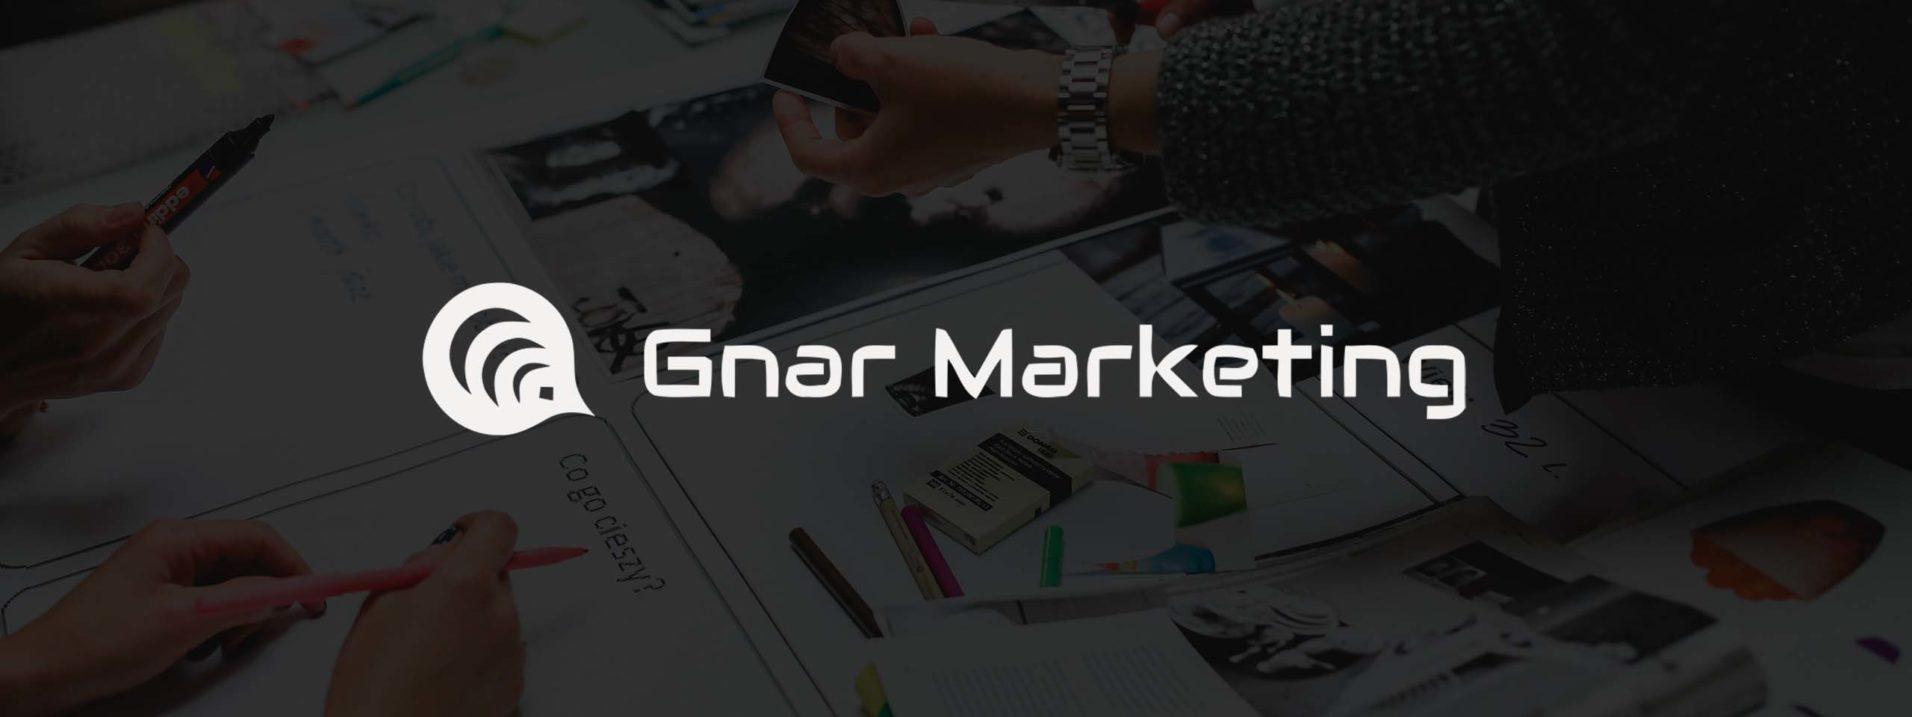 gnar-marketing-subscriptions-ecommerce